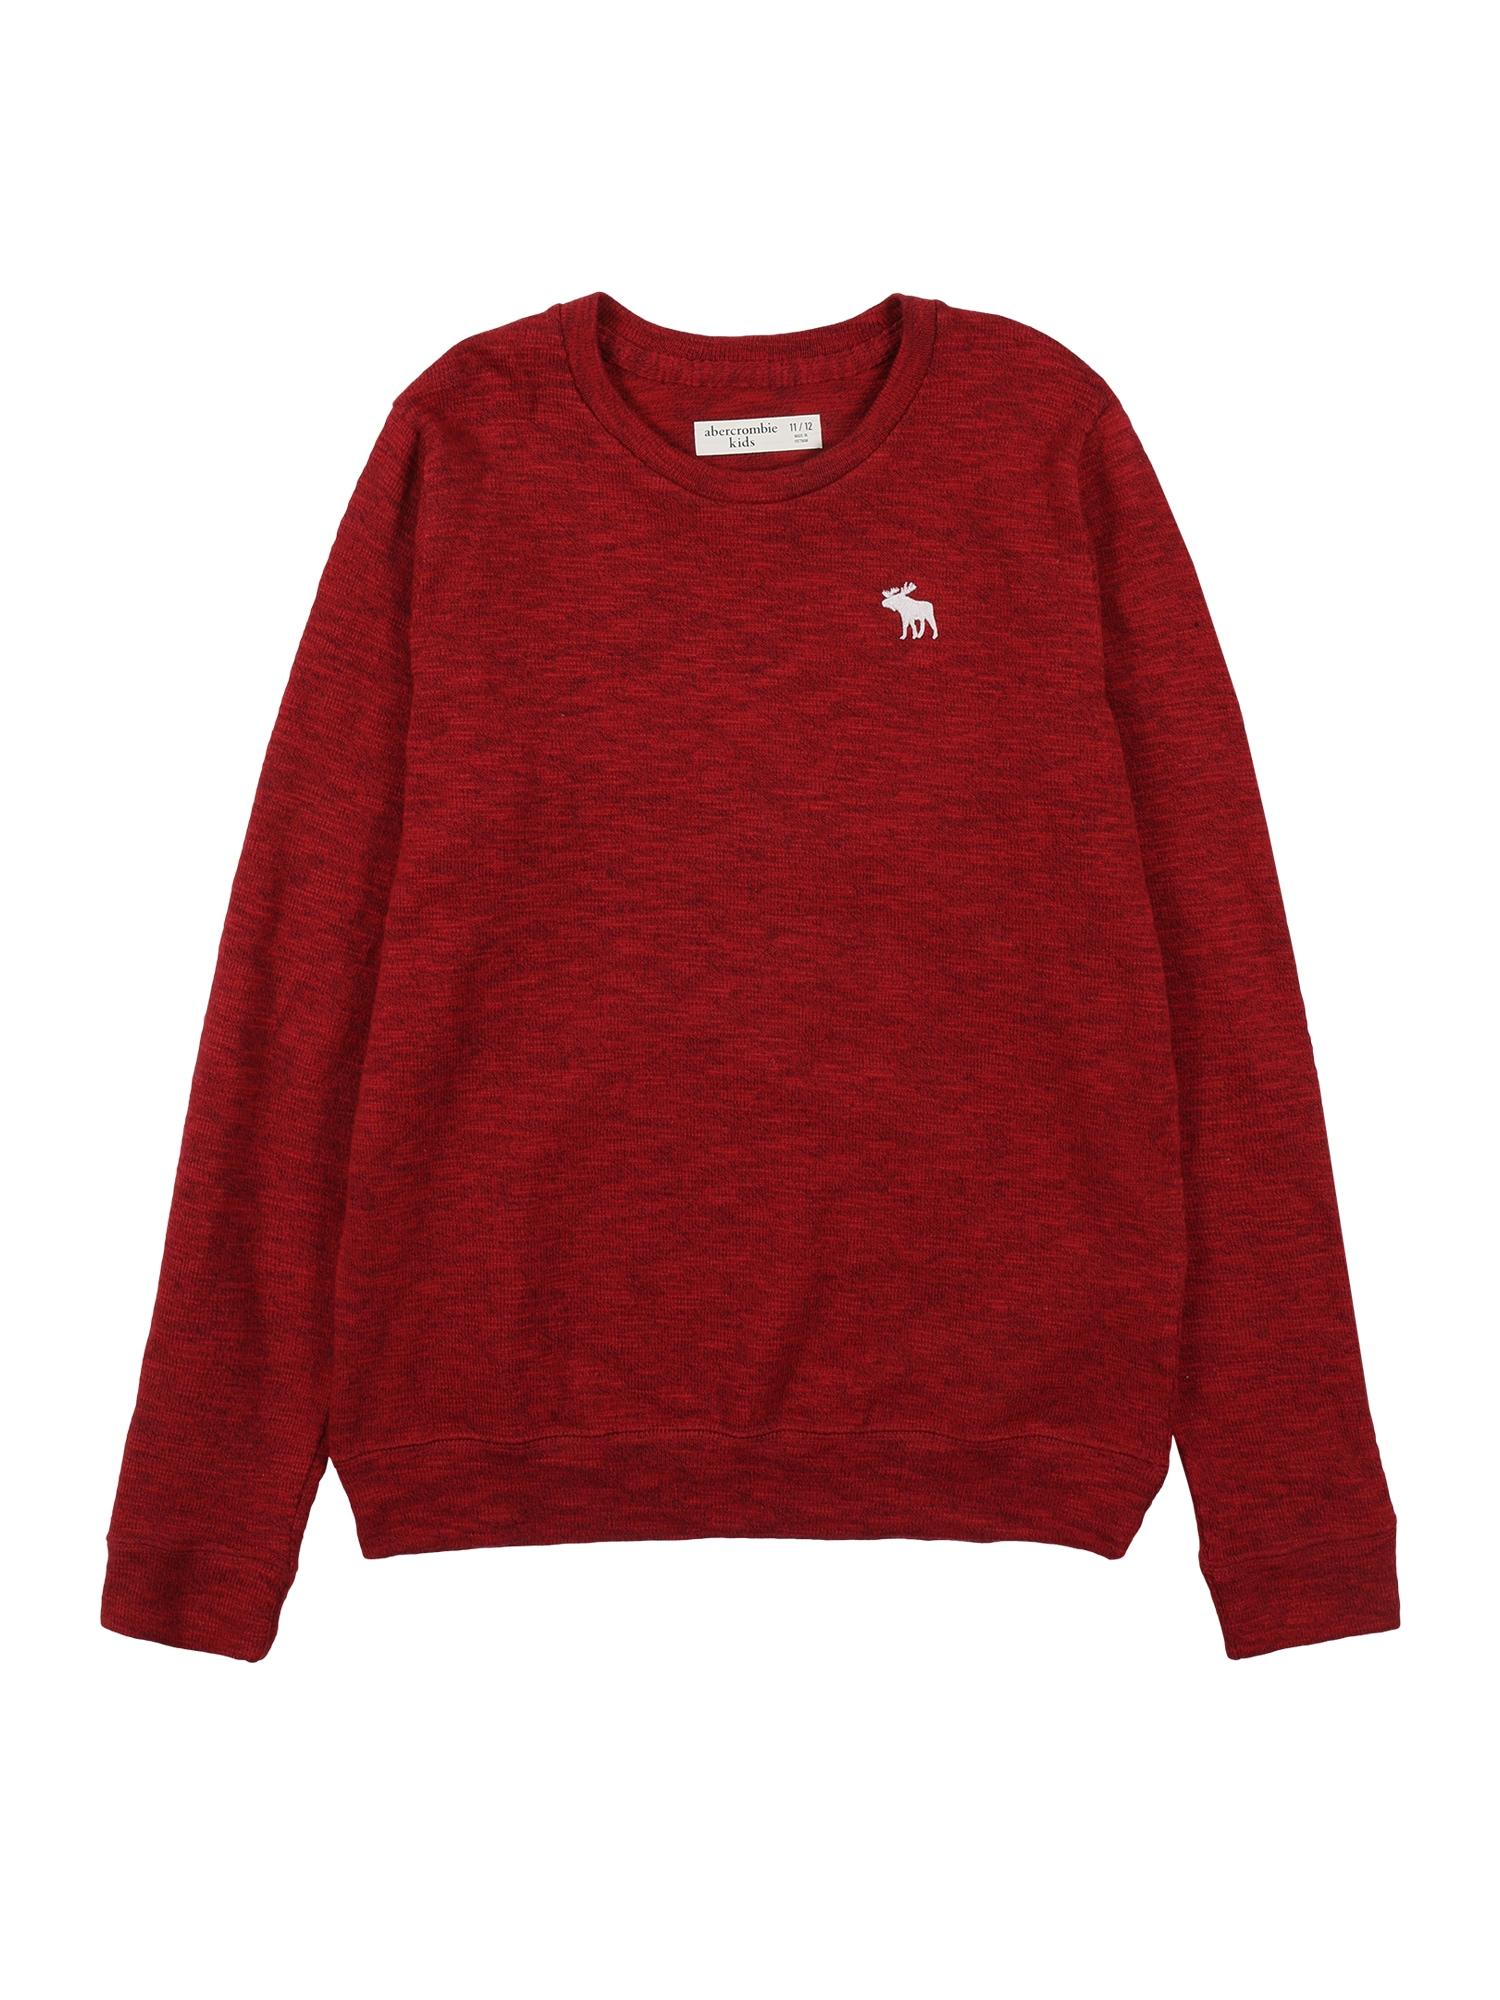 Abercrombie & Fitch Megztinis raudona / balta / tamsiai raudona